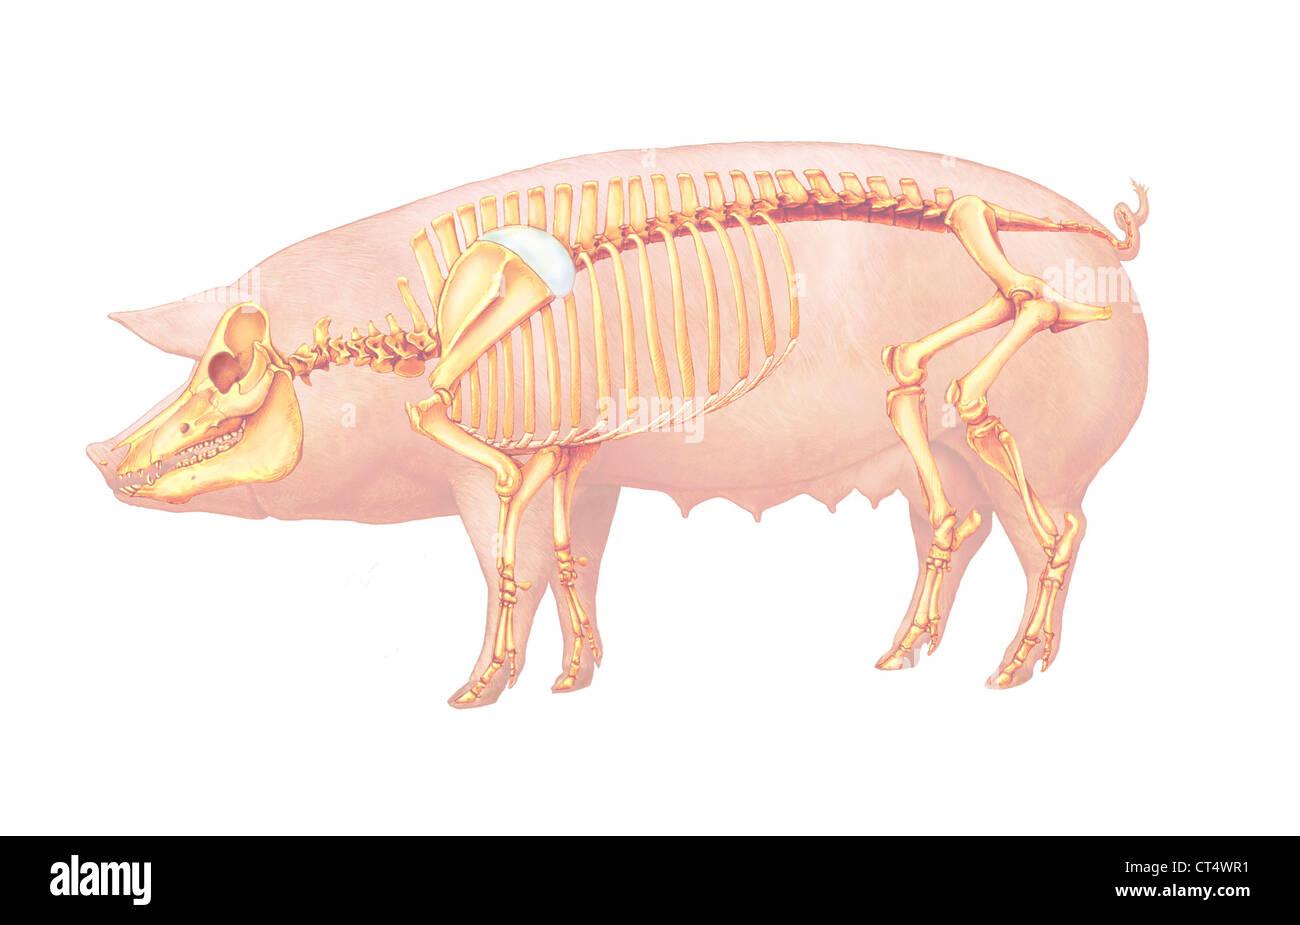 Anatomía del cerdo, dibujo Foto & Imagen De Stock: 49280533 - Alamy